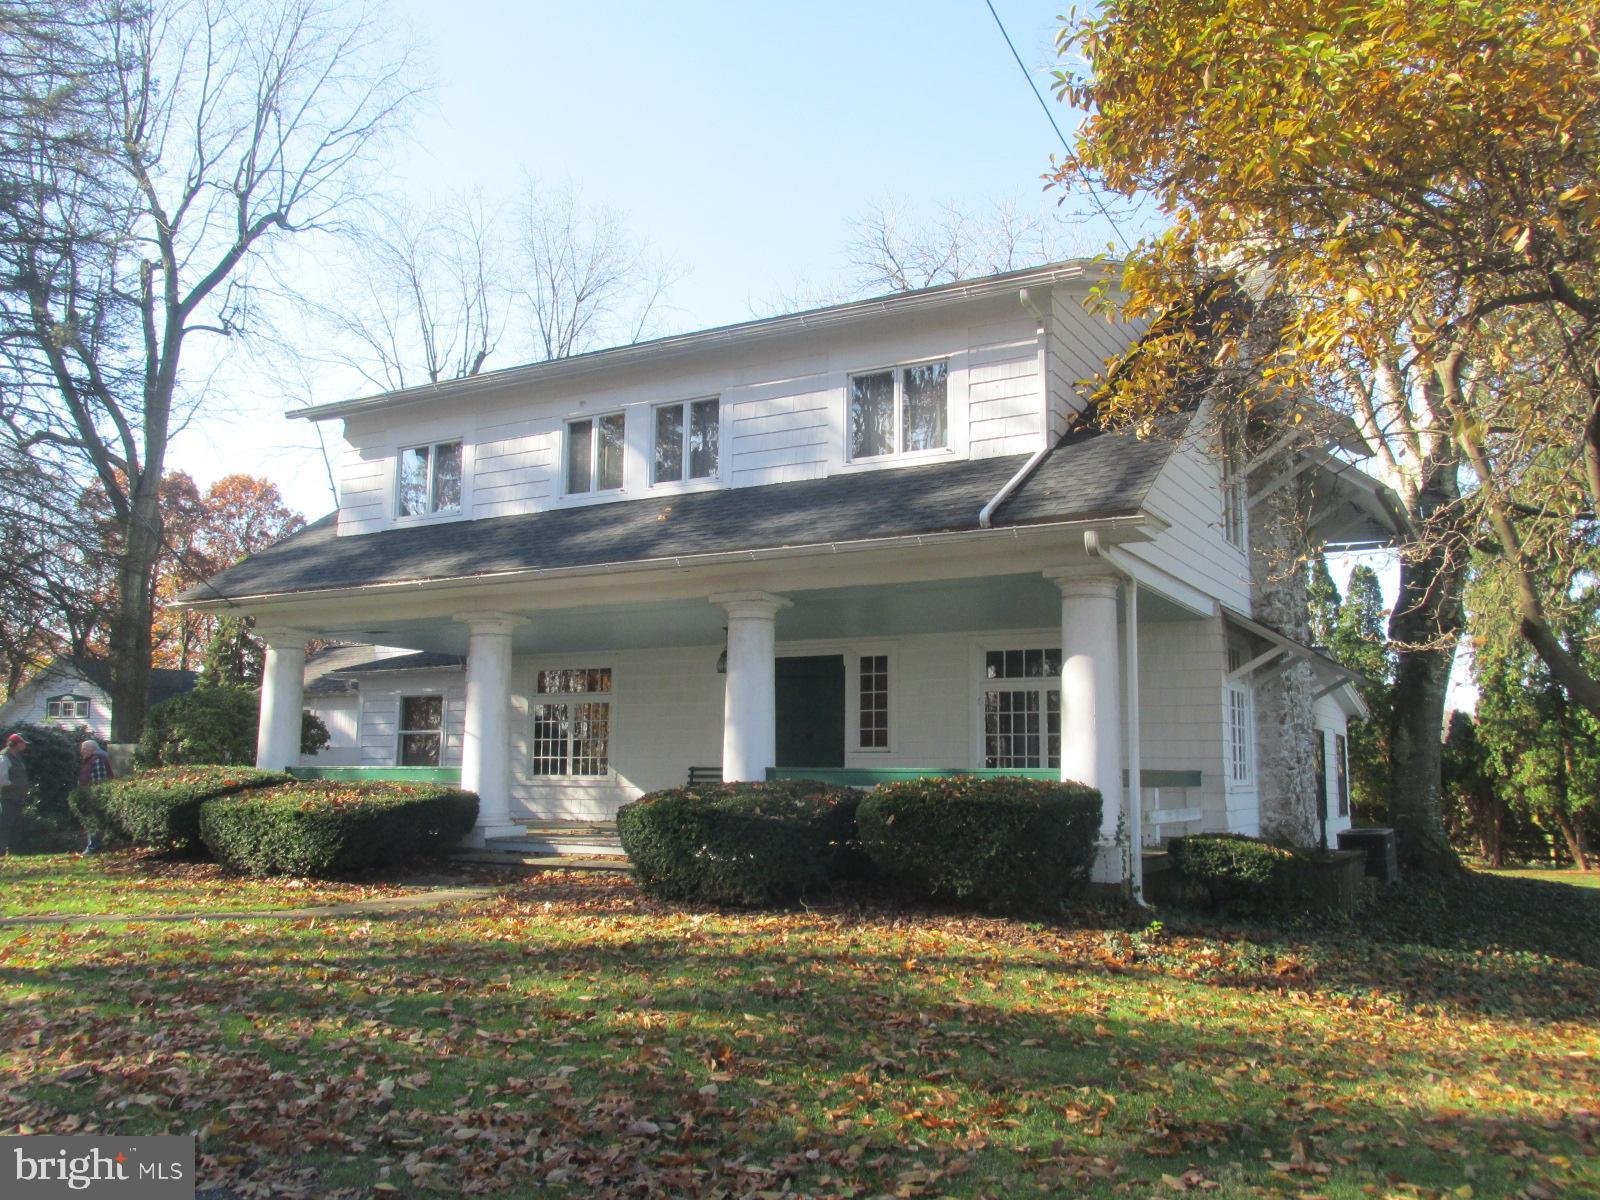 1778 Kecks Road, Breinigsville, PA 18031